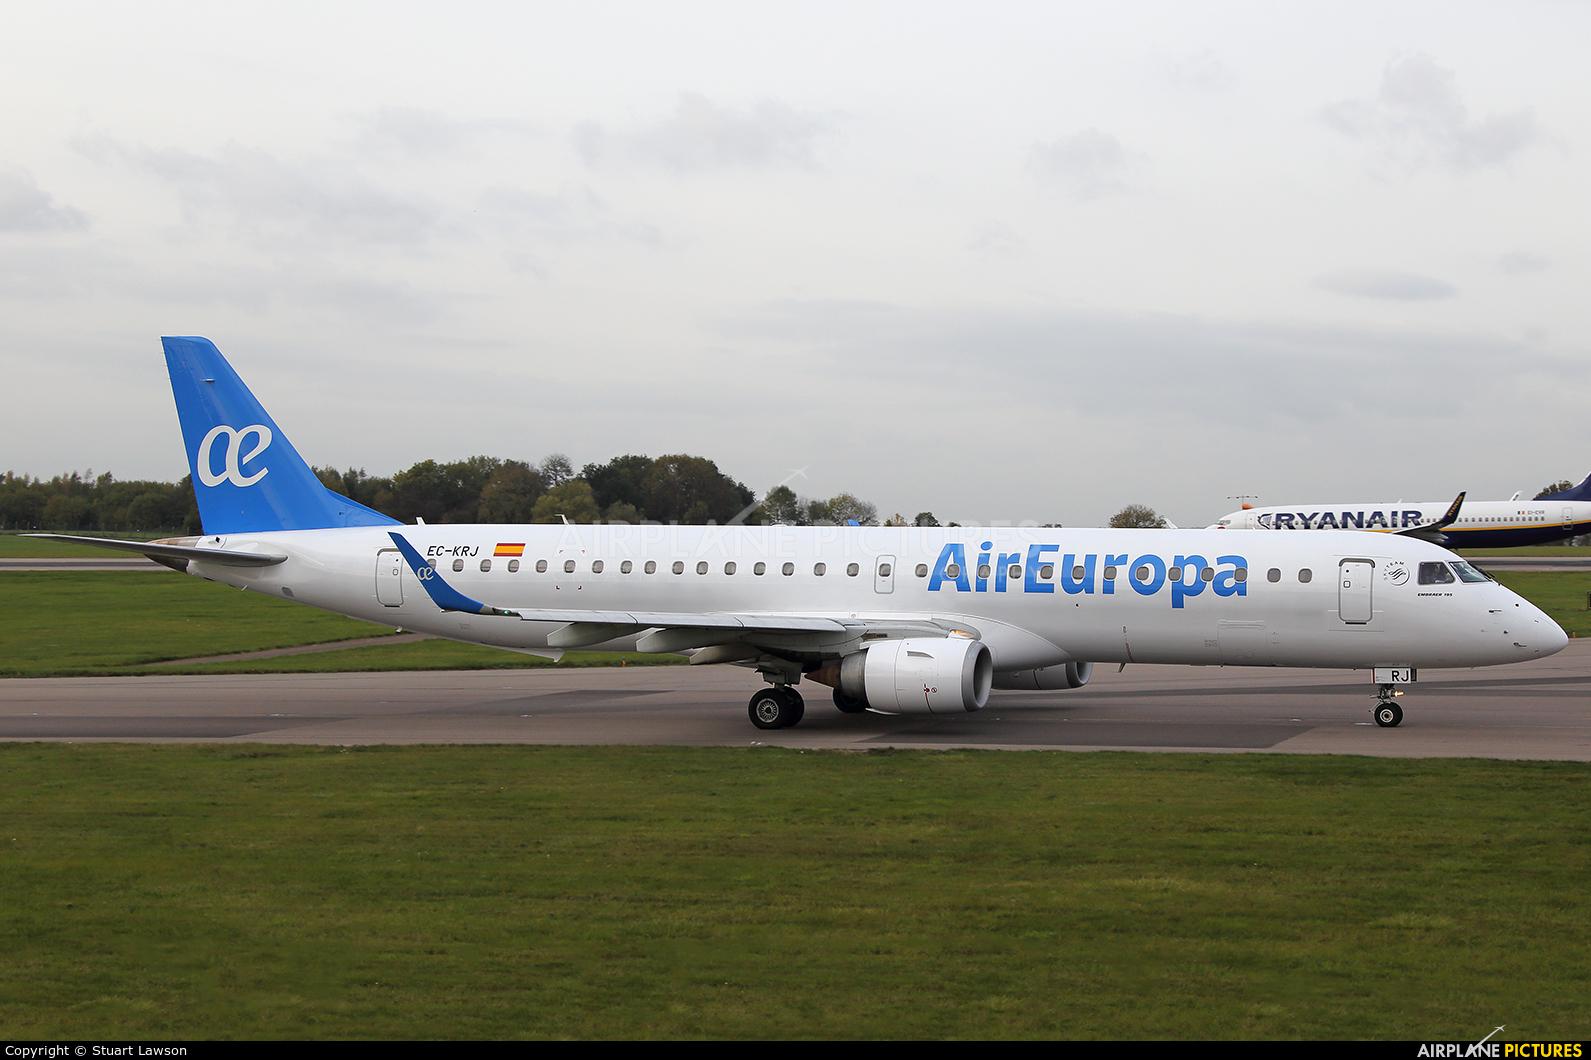 Air Europa EC-KRJ aircraft at East Midlands